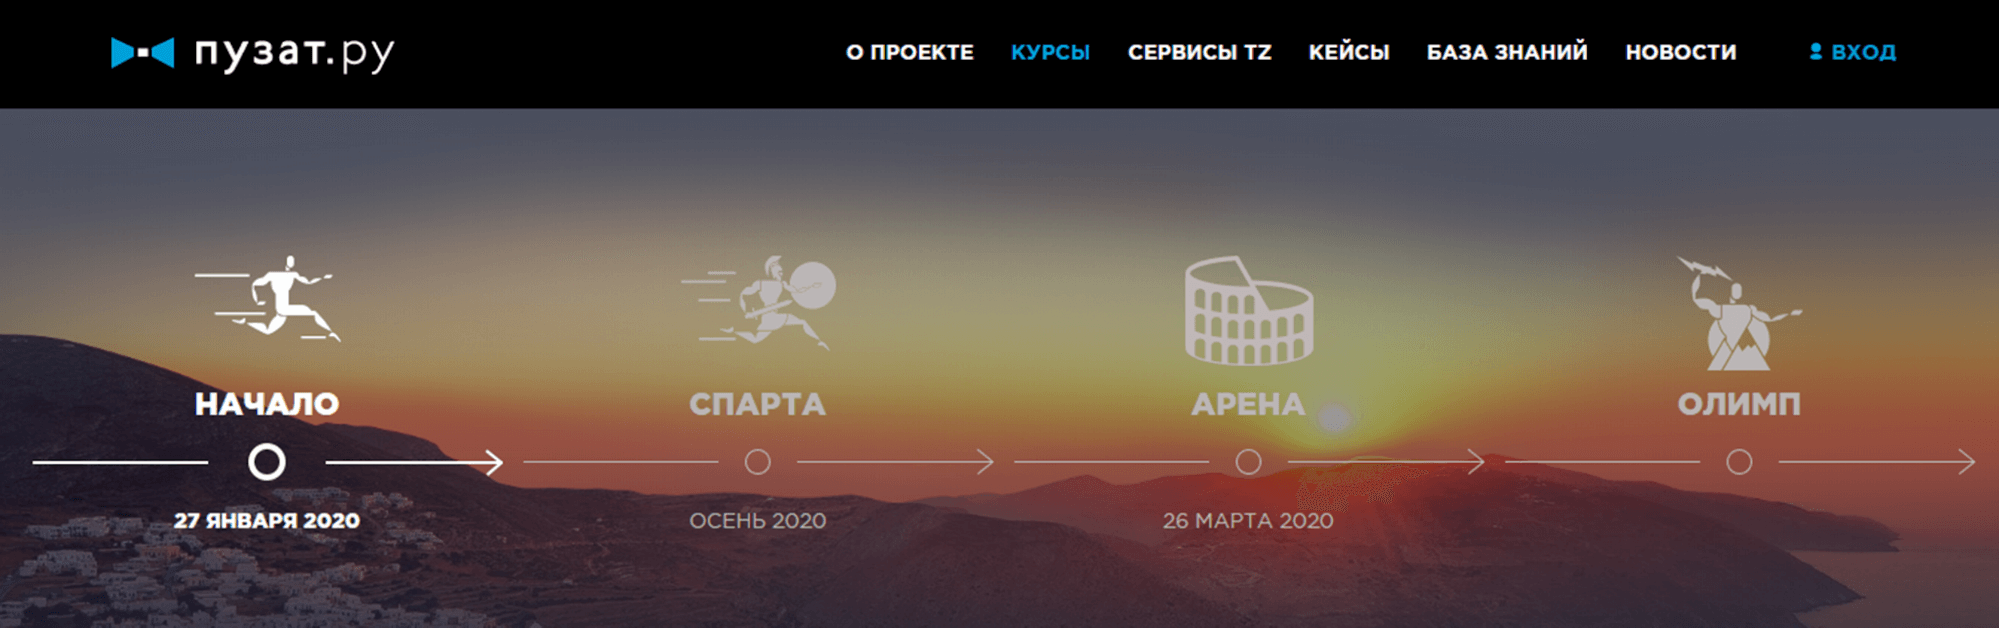 Пузат.ру